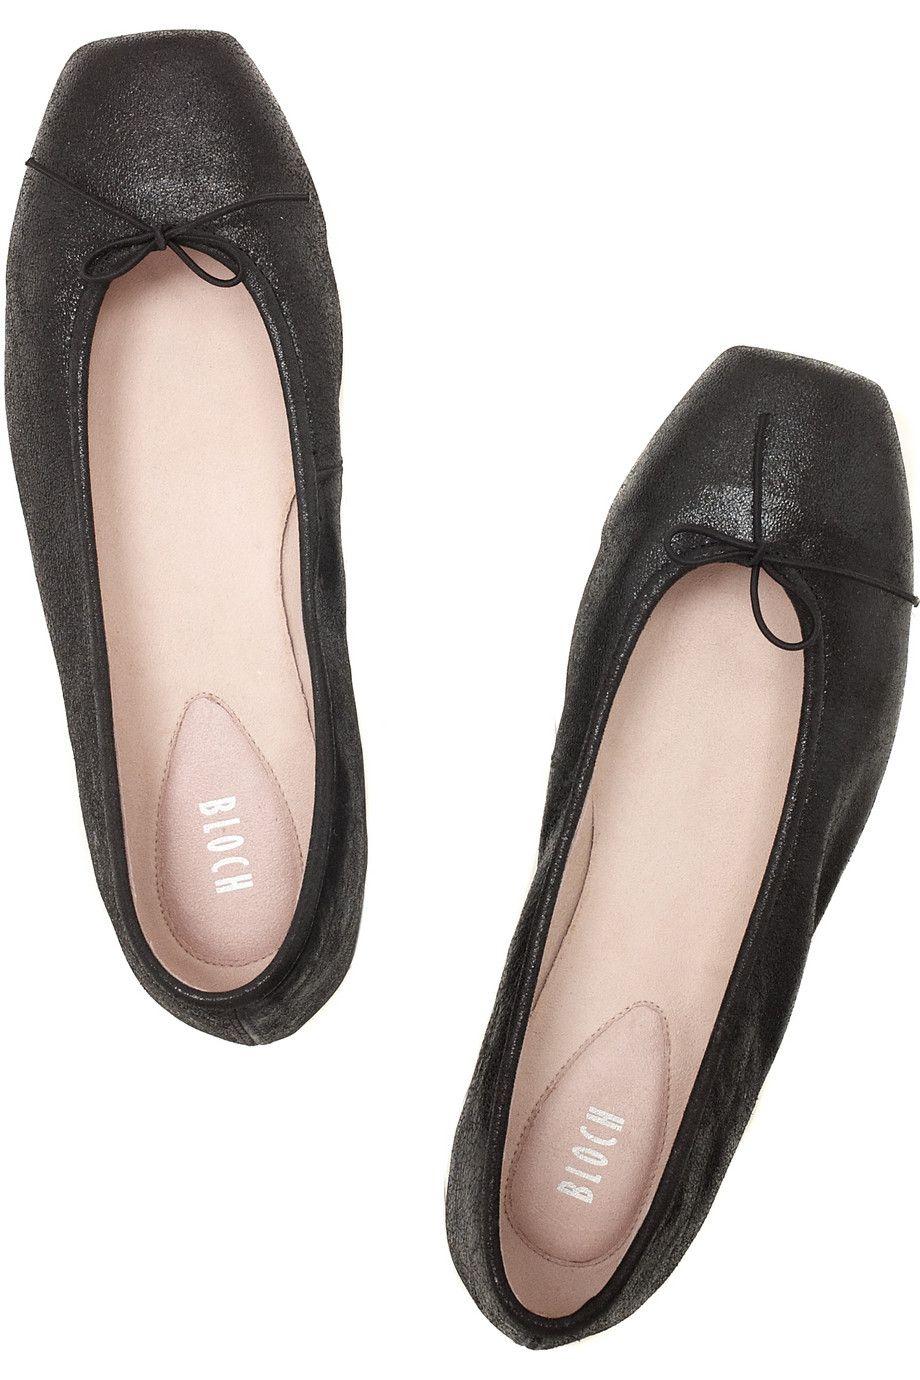 Black Stardust leather square-toe